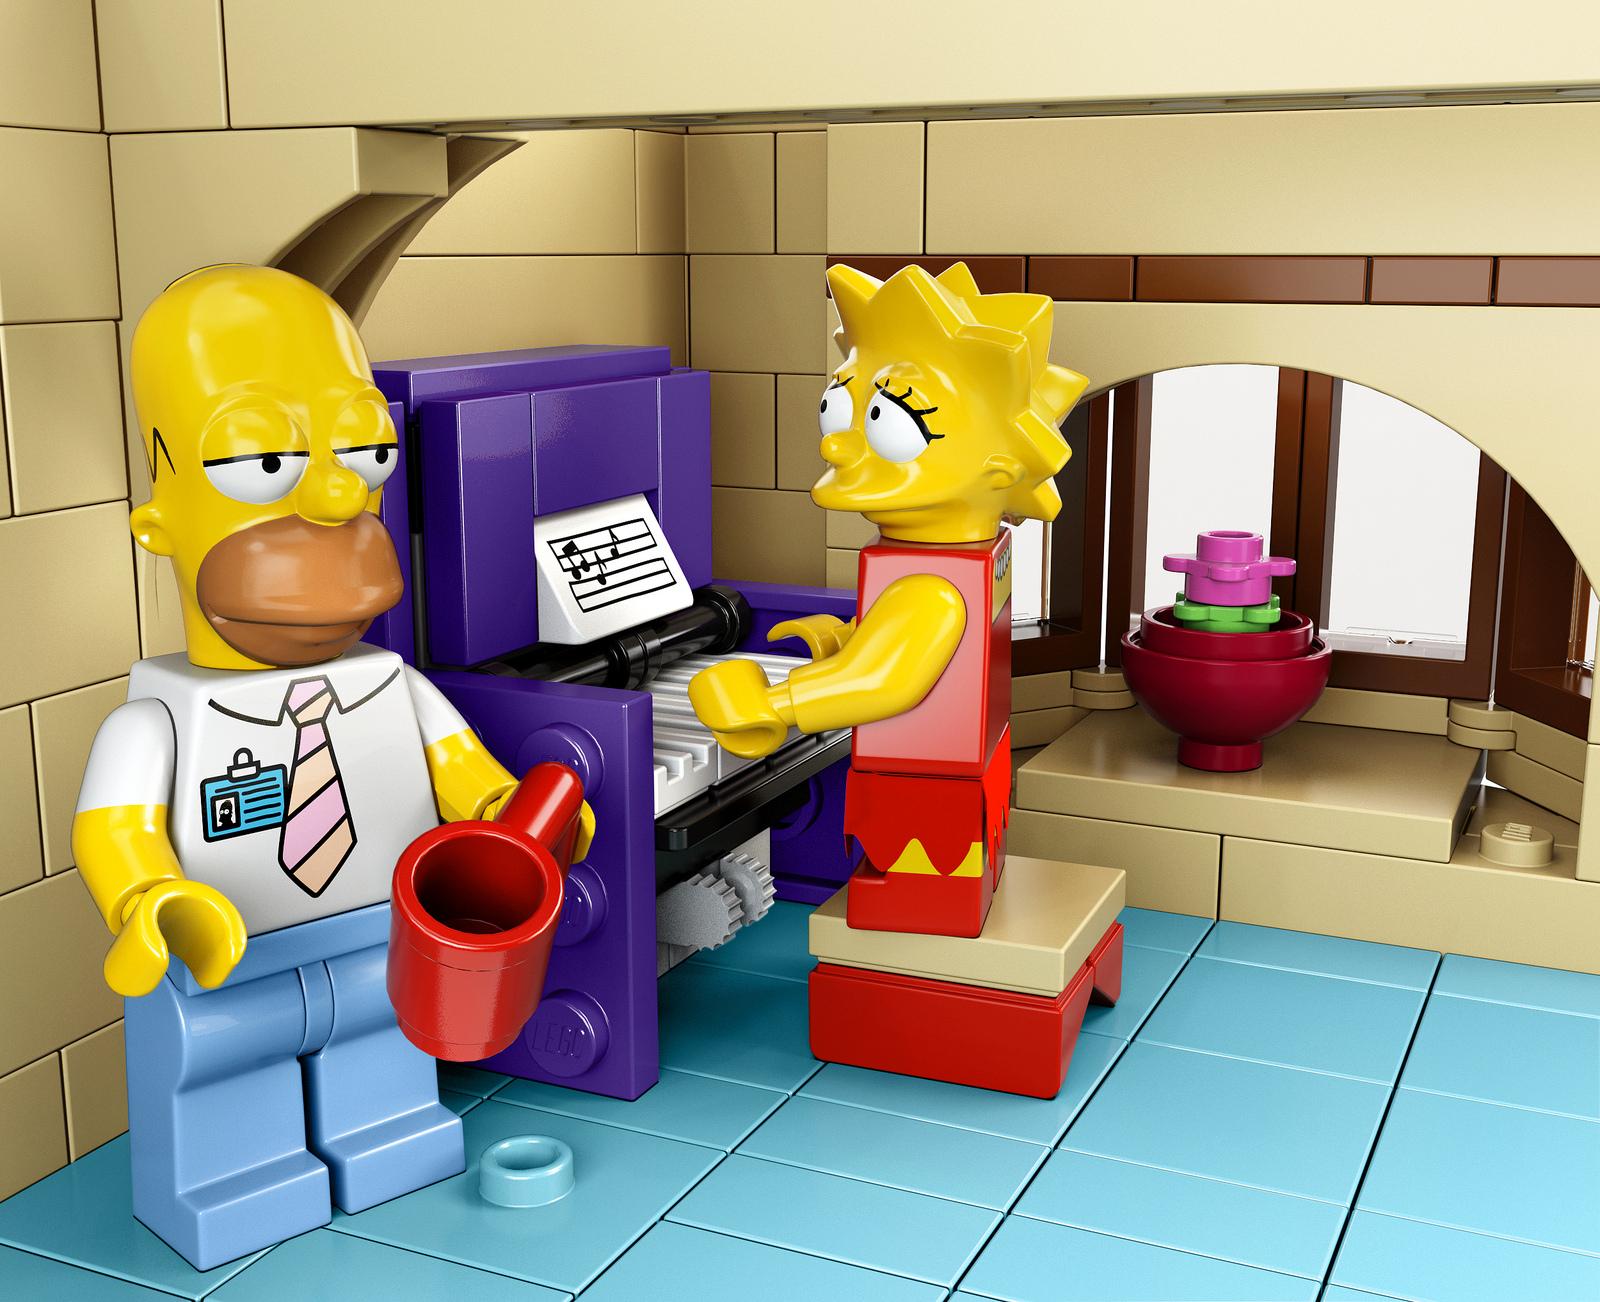 Maison-Lego-Simpsons-010